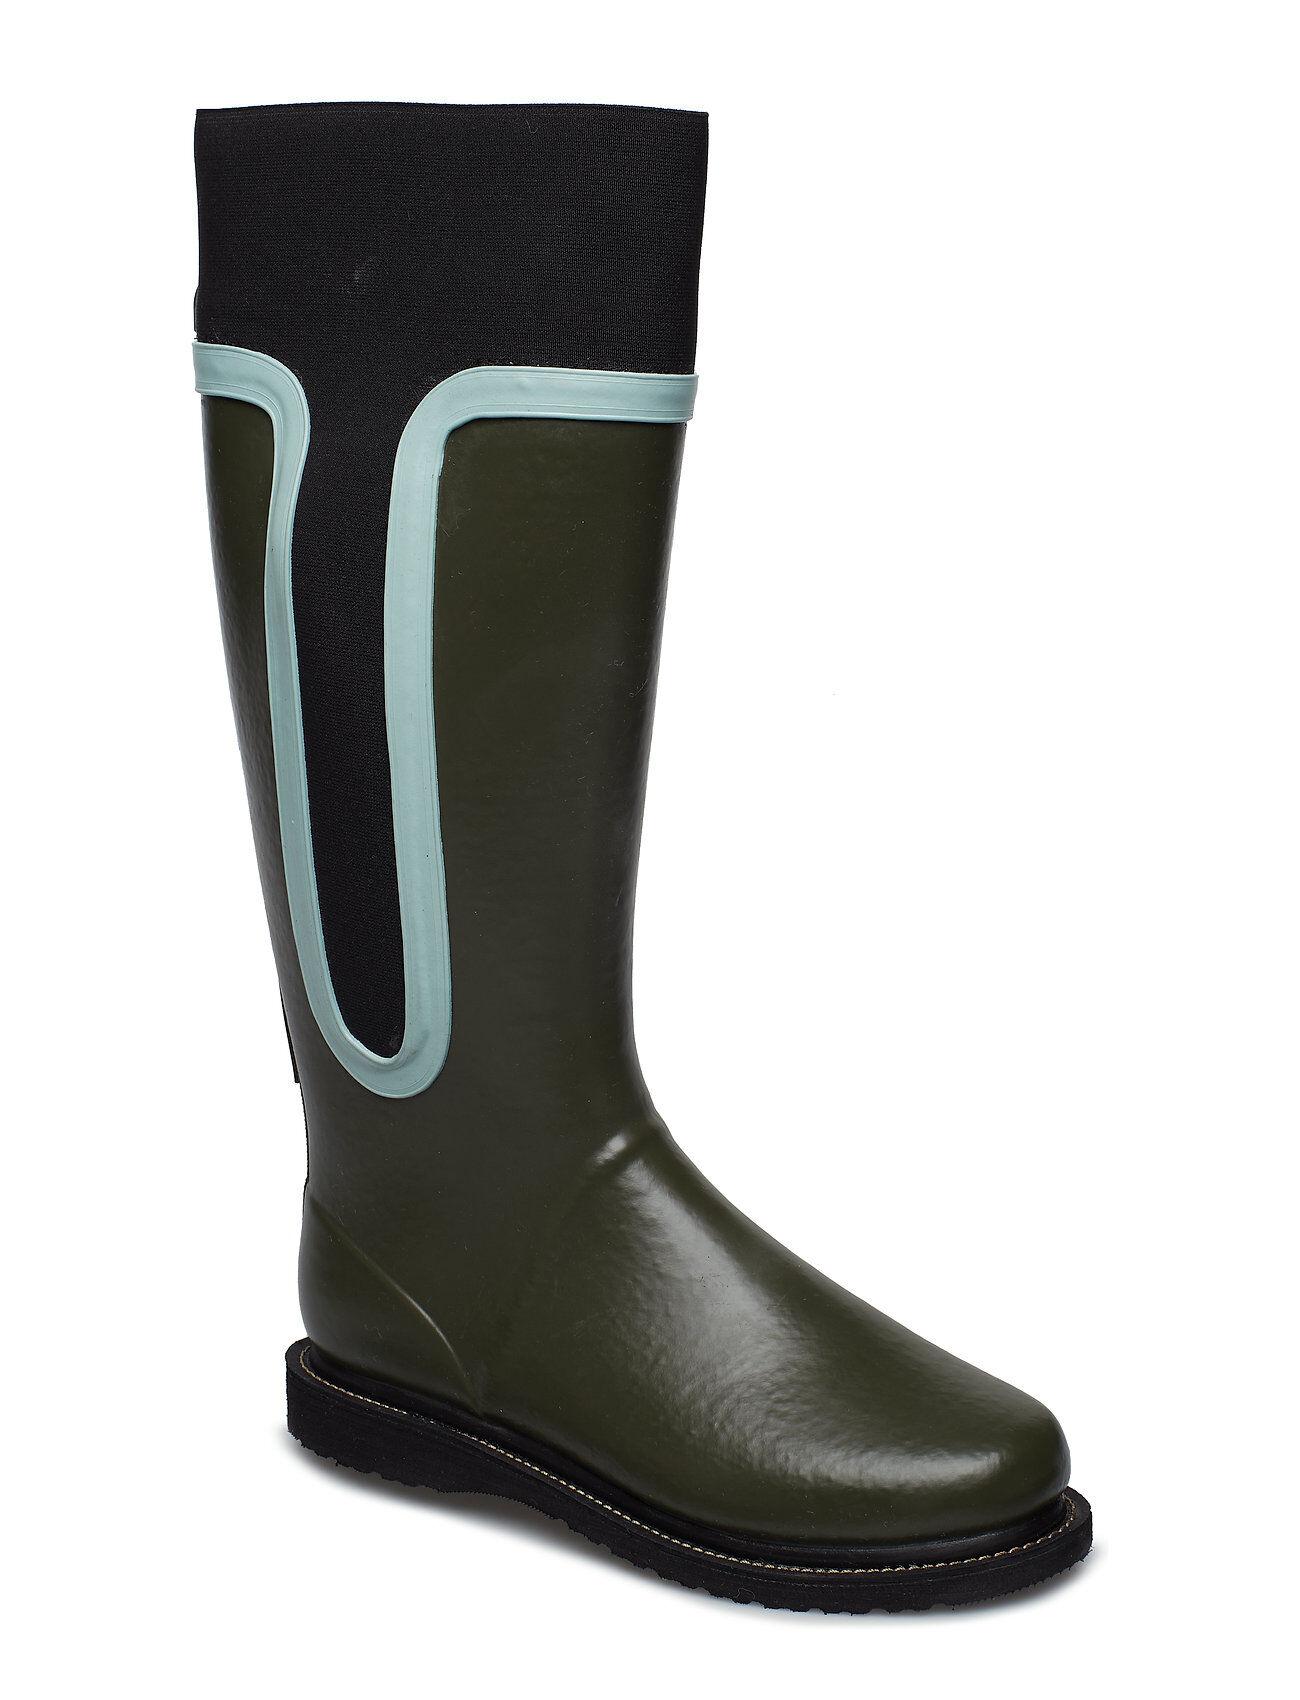 Ilse Jacobsen High Rubber Boot